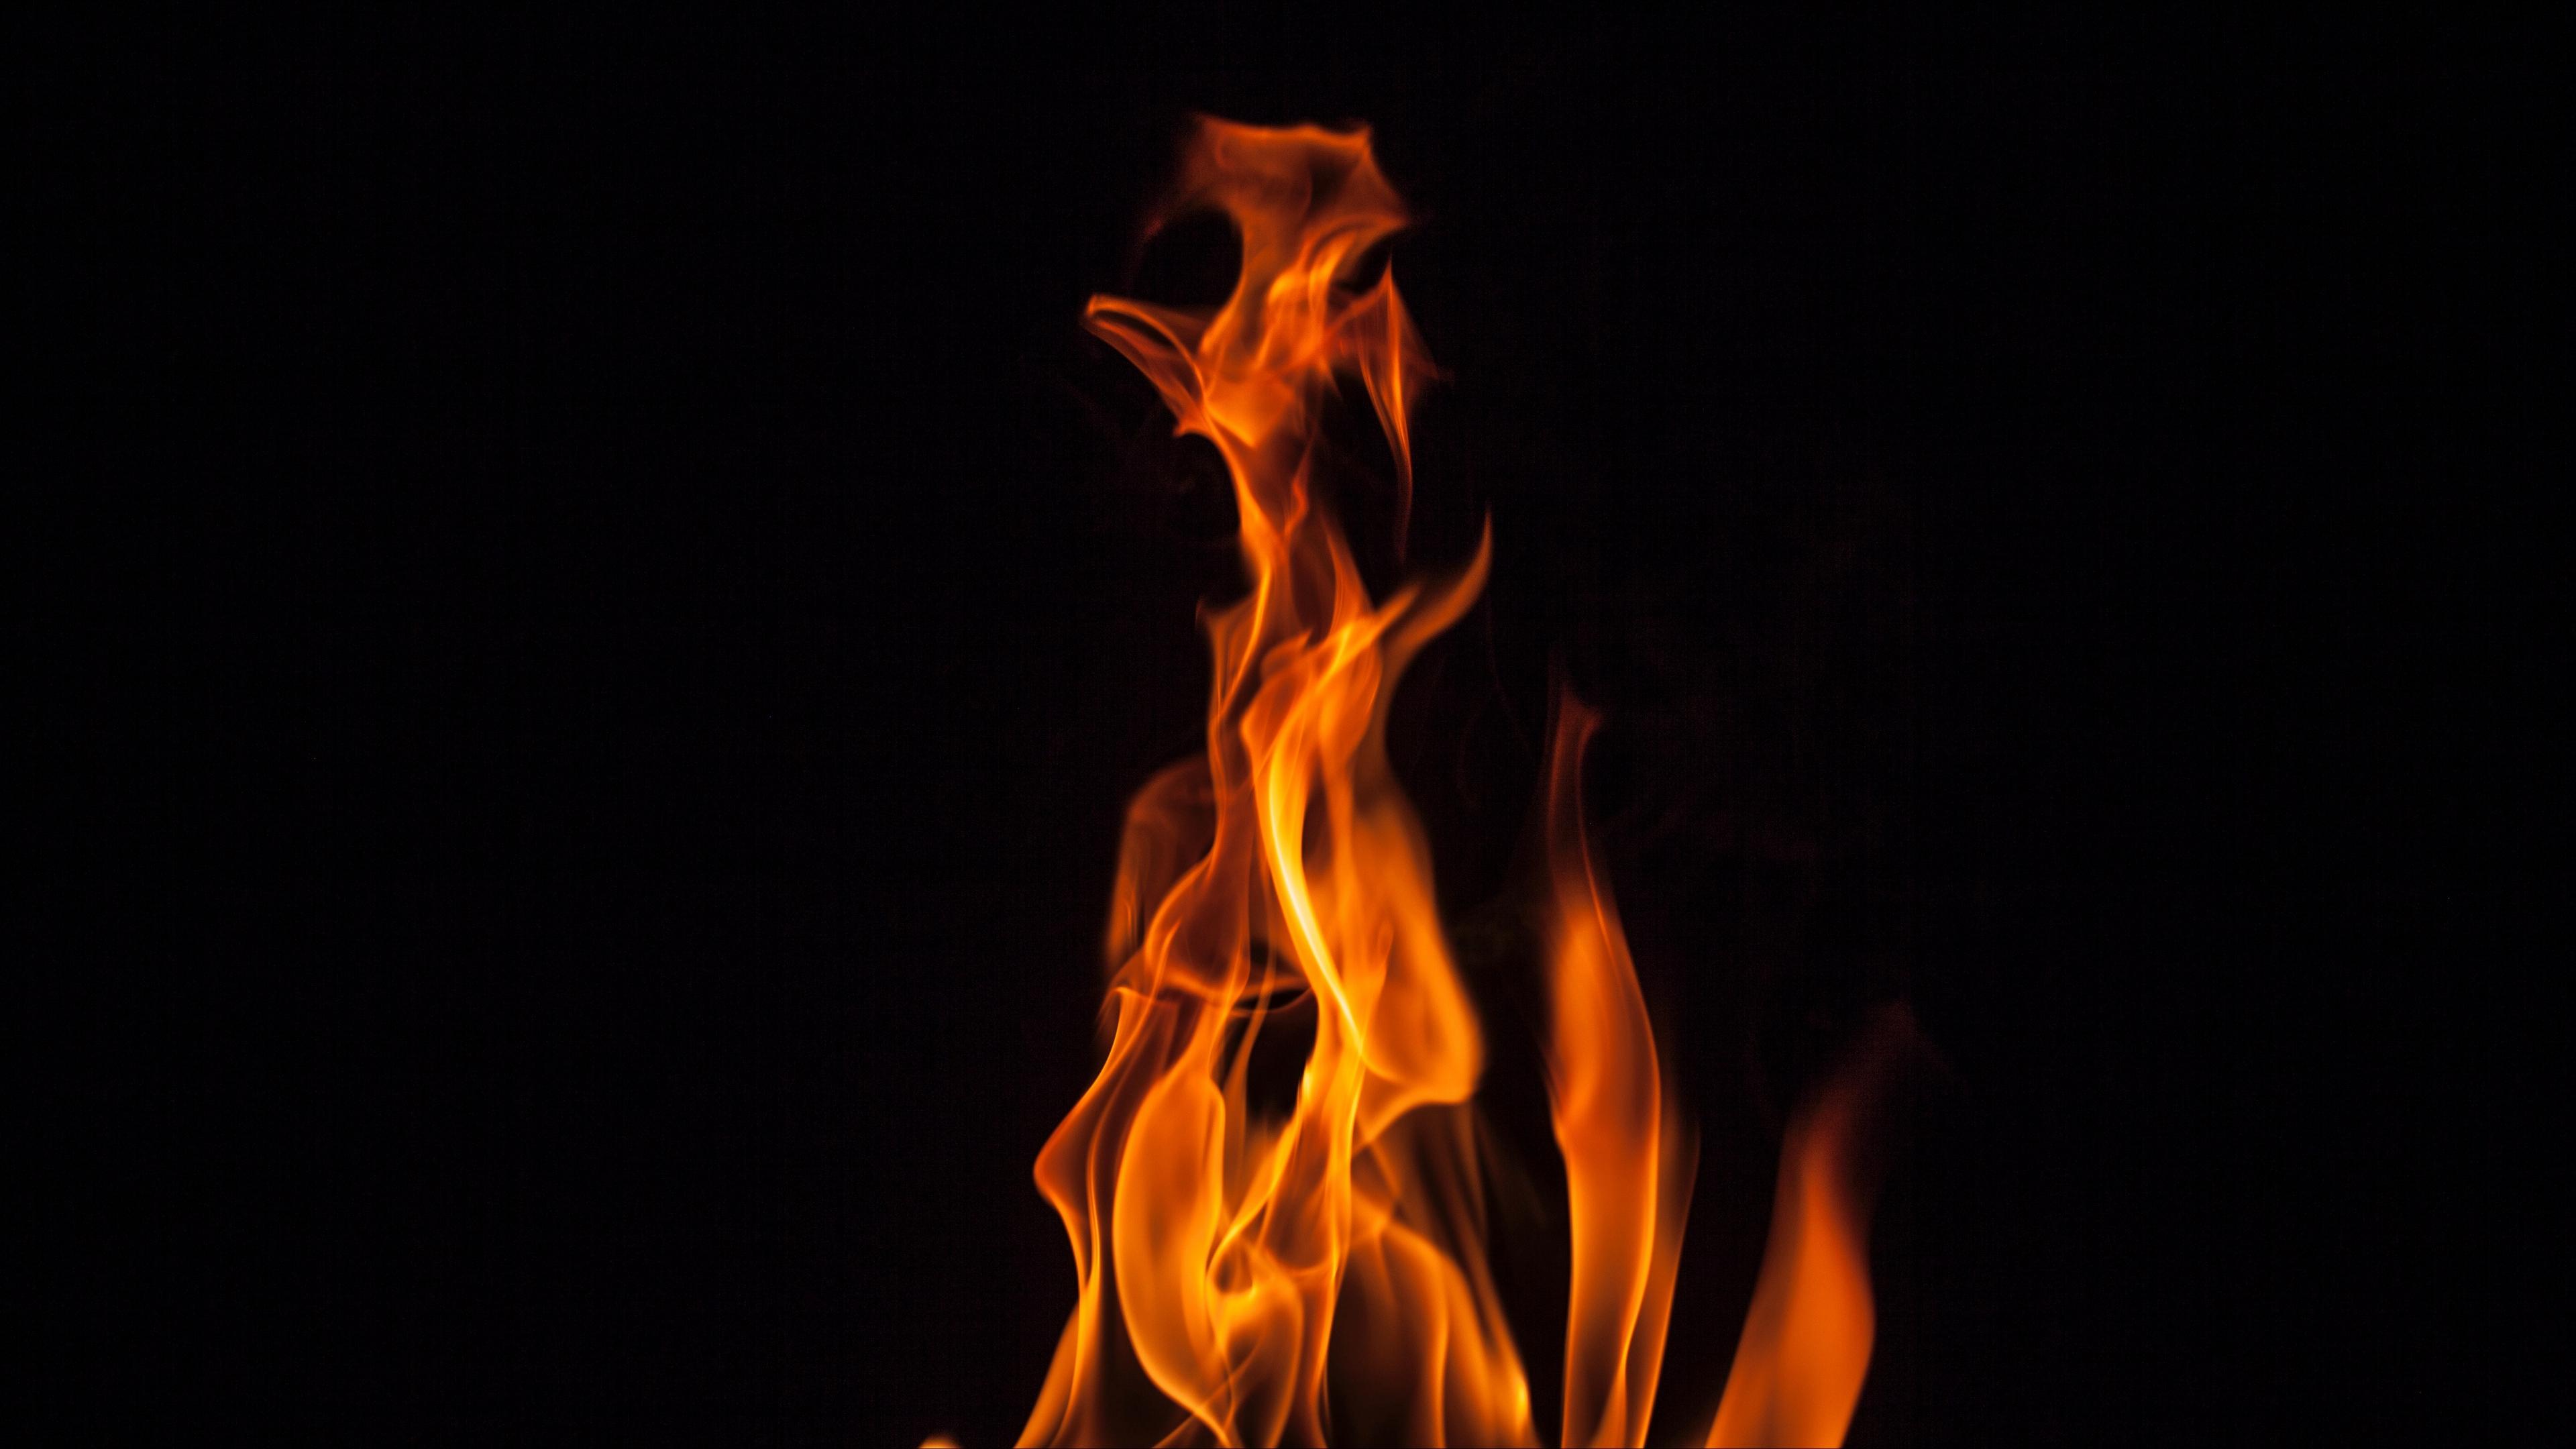 Wallpaper 4k Fire Flame Bonfire Dark Burning 4k Bonfire Fire Flame